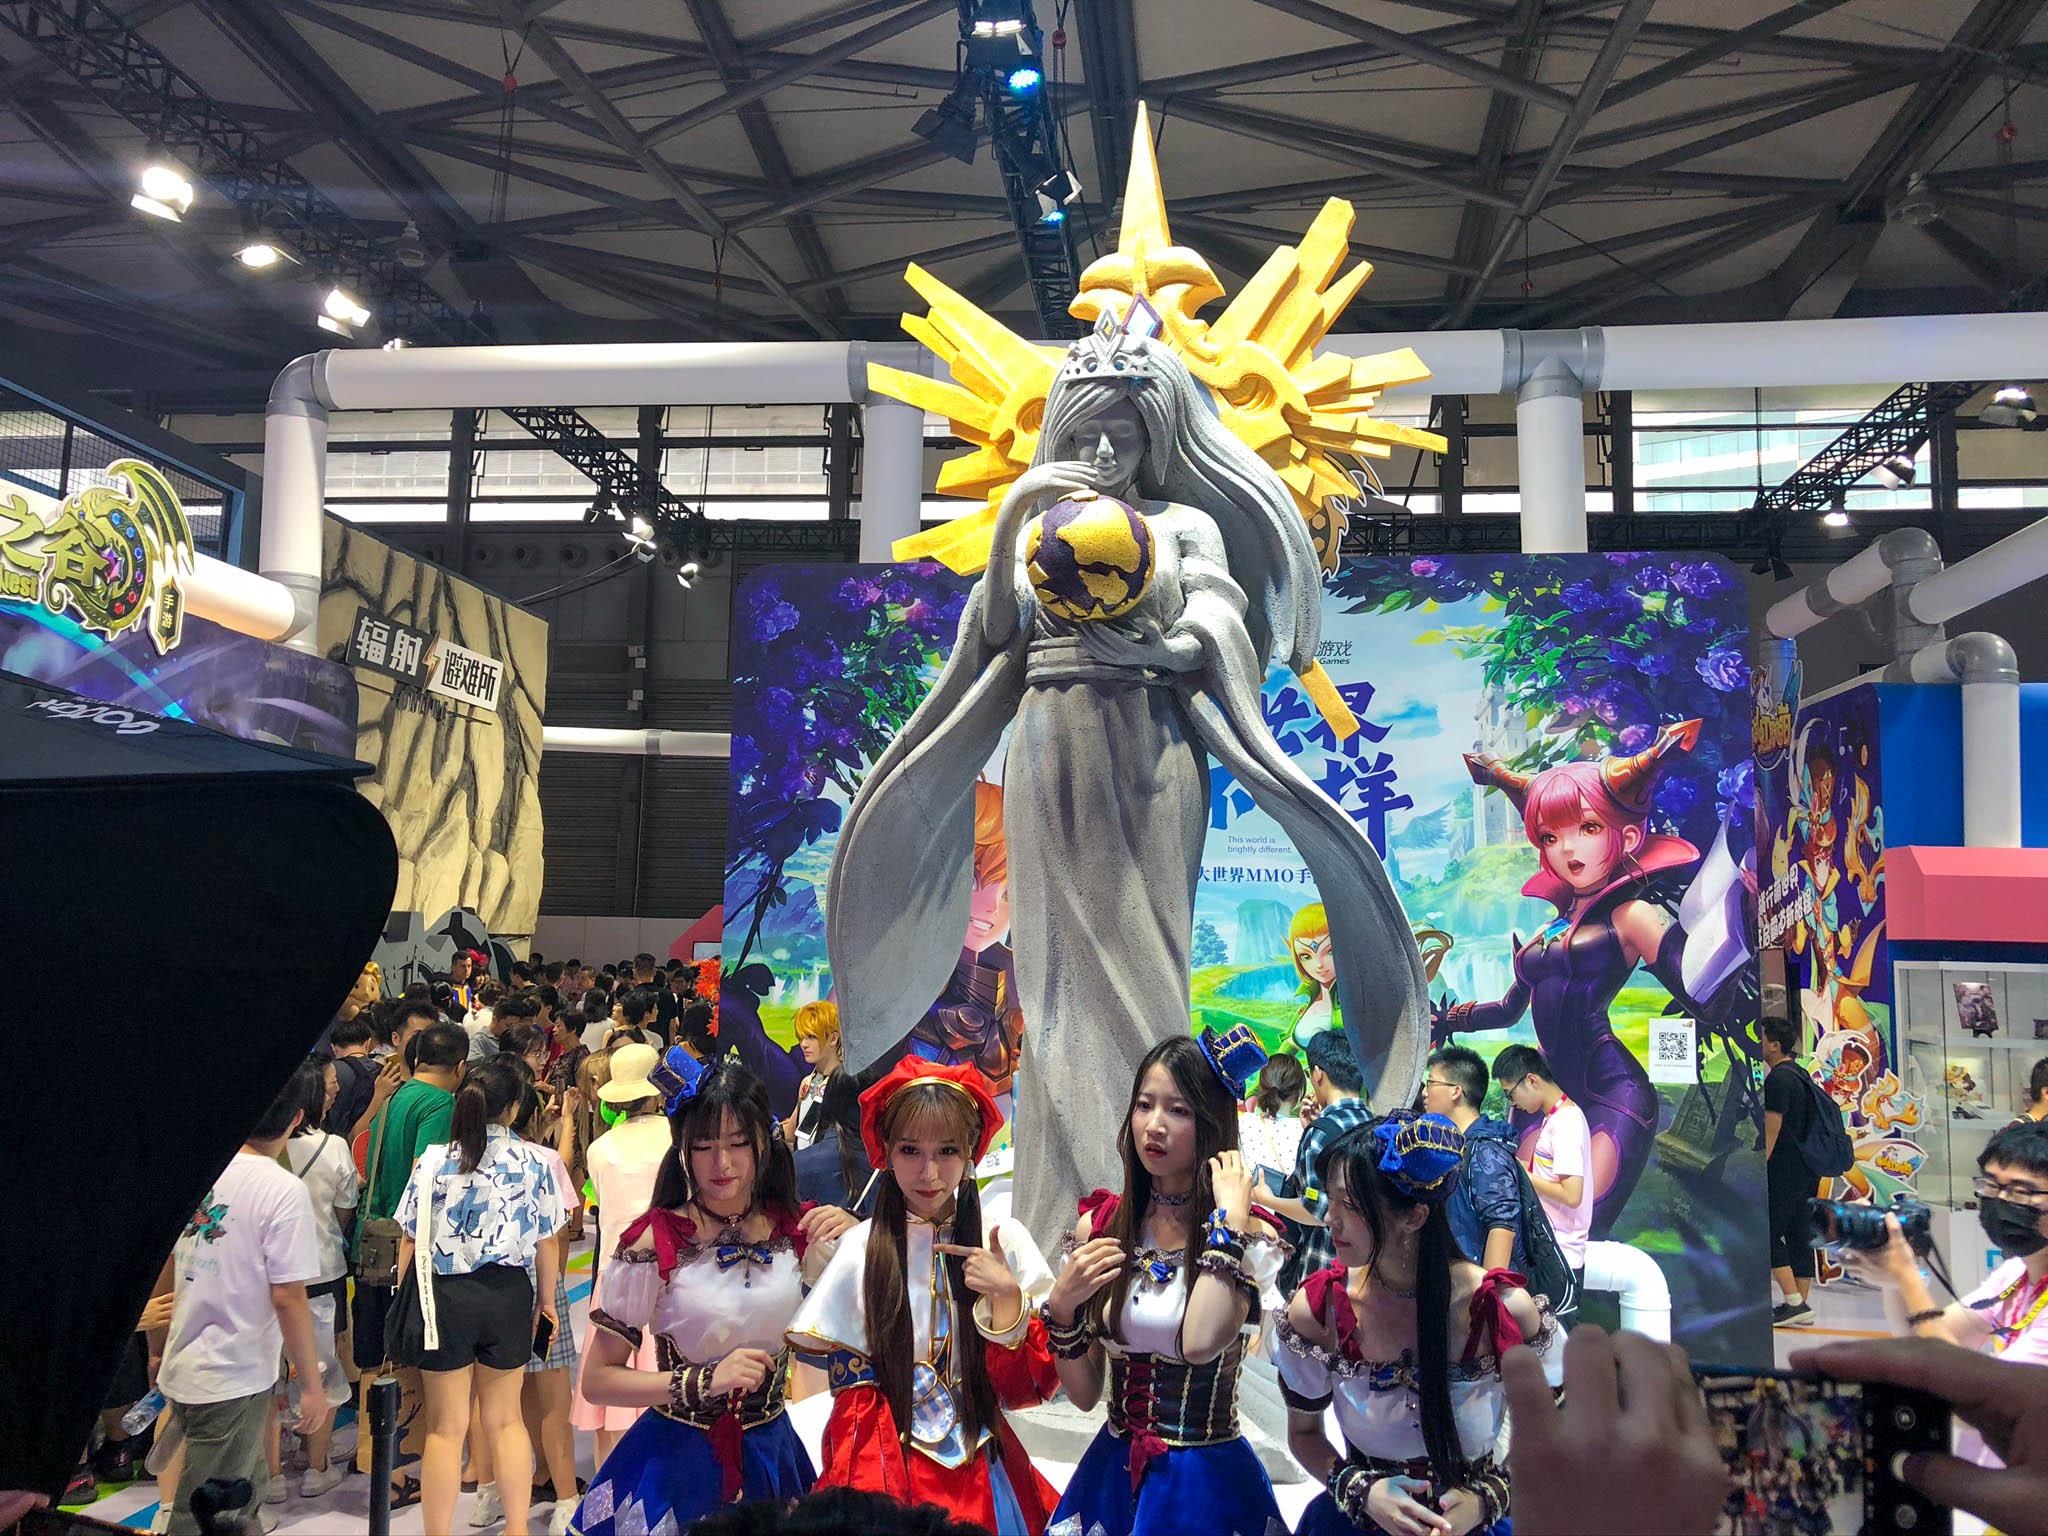 2019 ChinaJoy 中国国际数码互动娱乐展览会 游玩 第46张